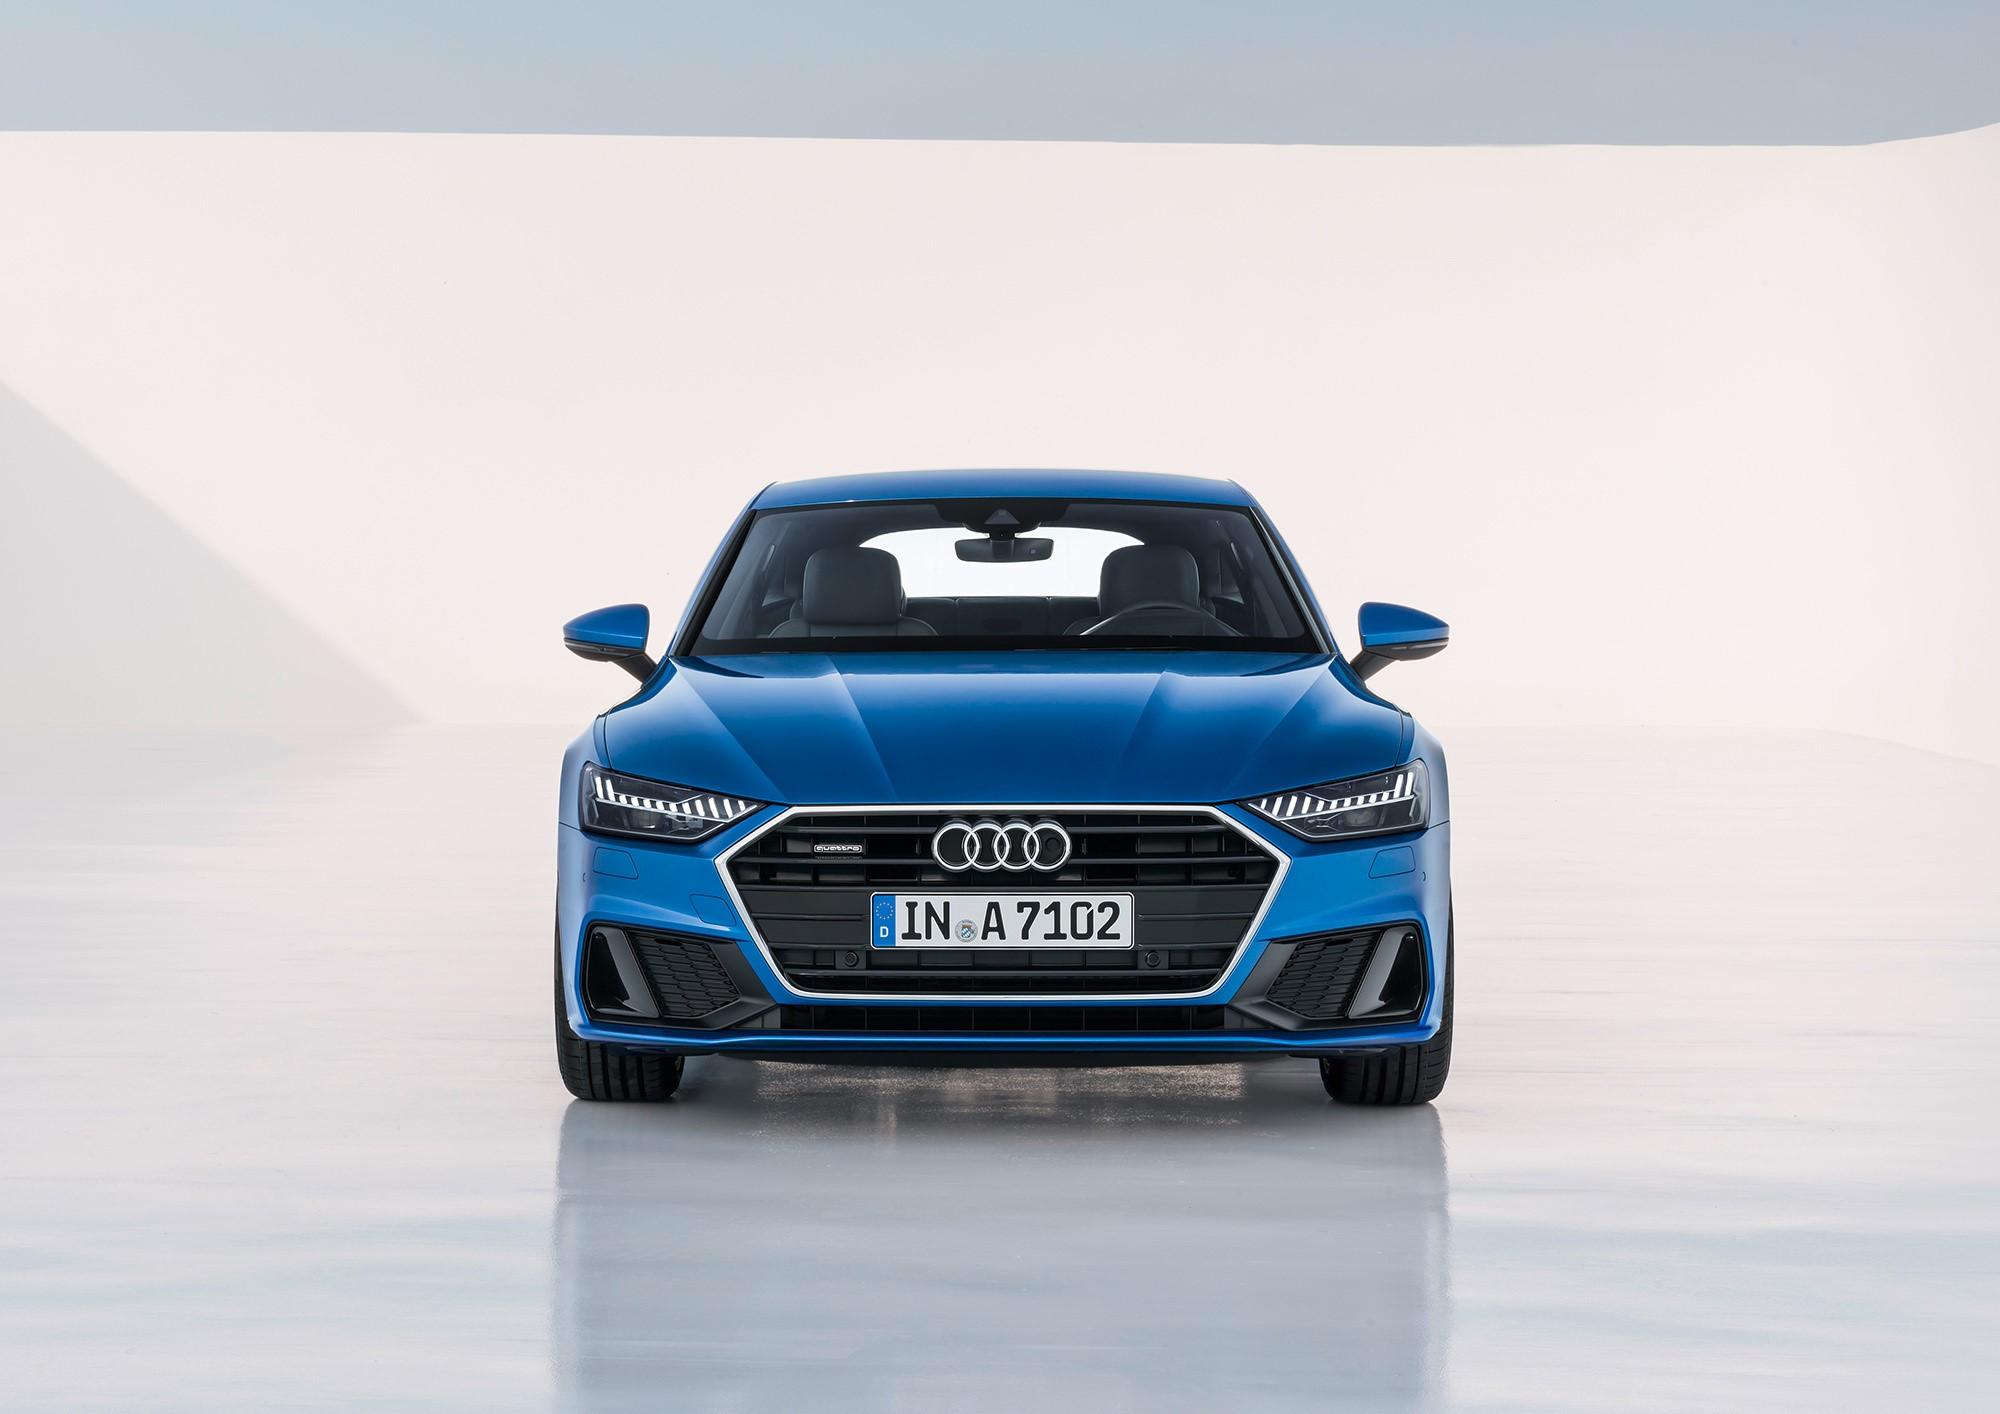 Audi A7 Background